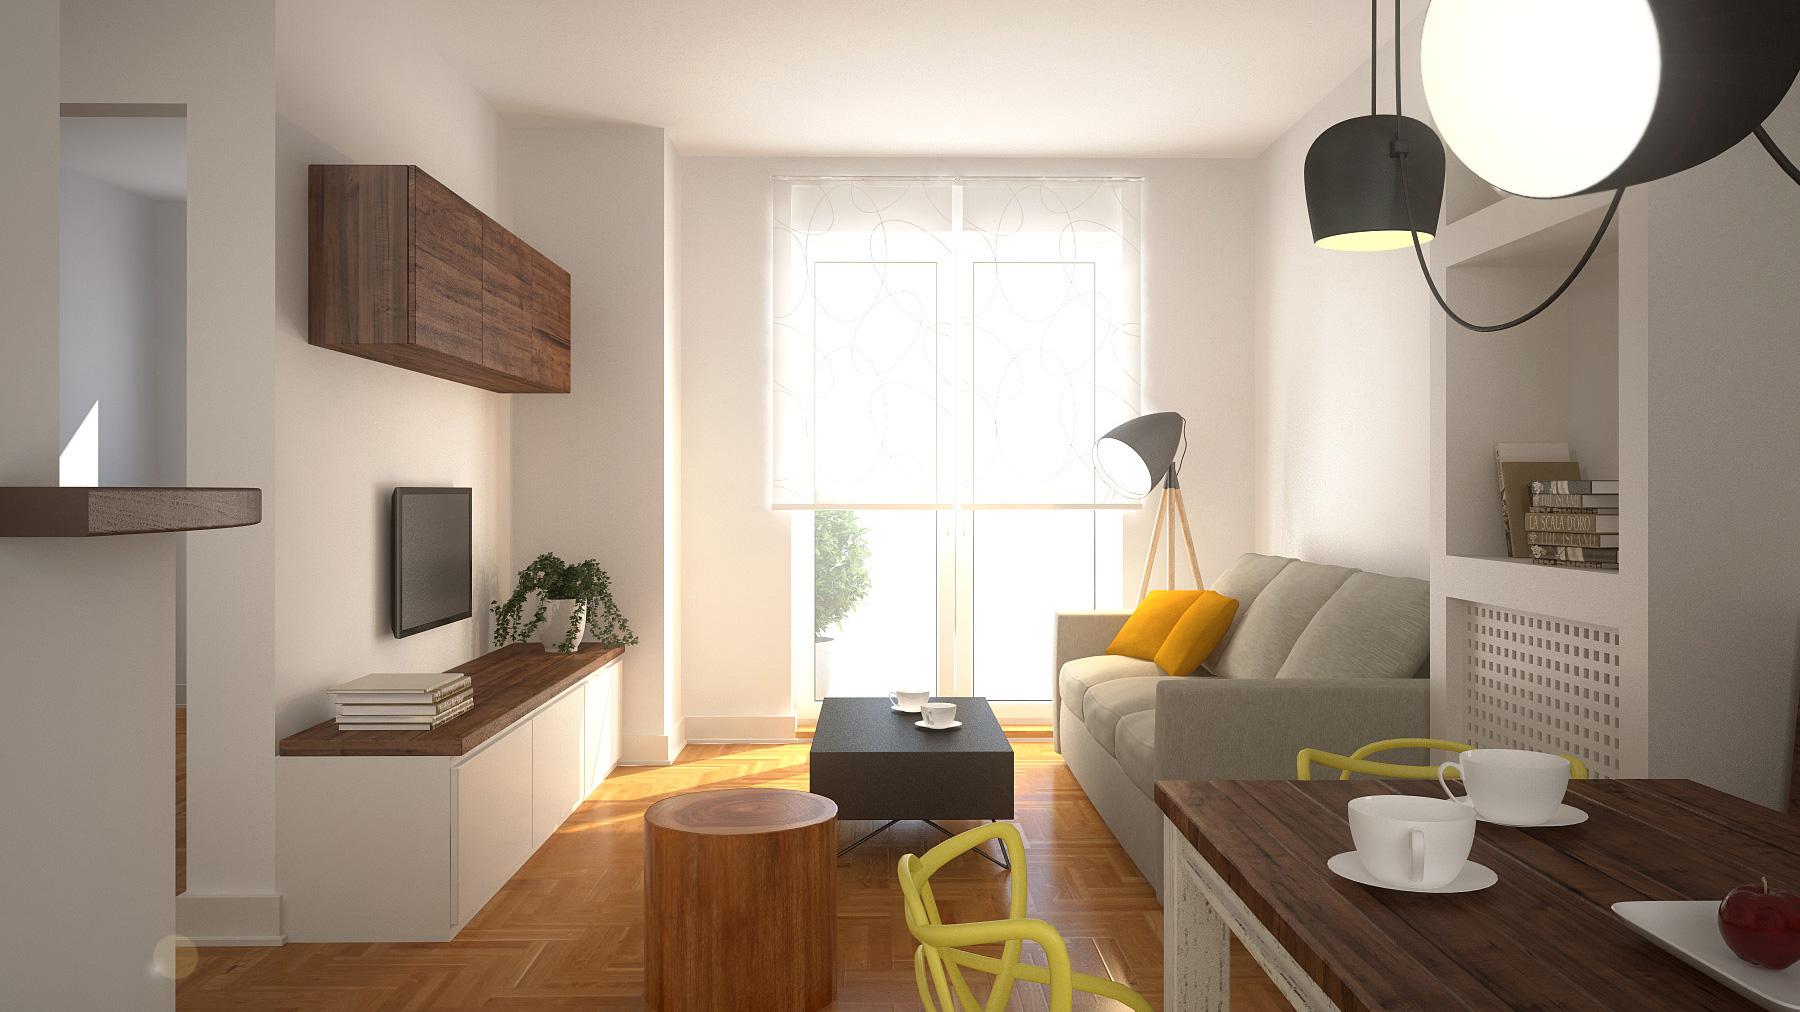 Stepa S apartment